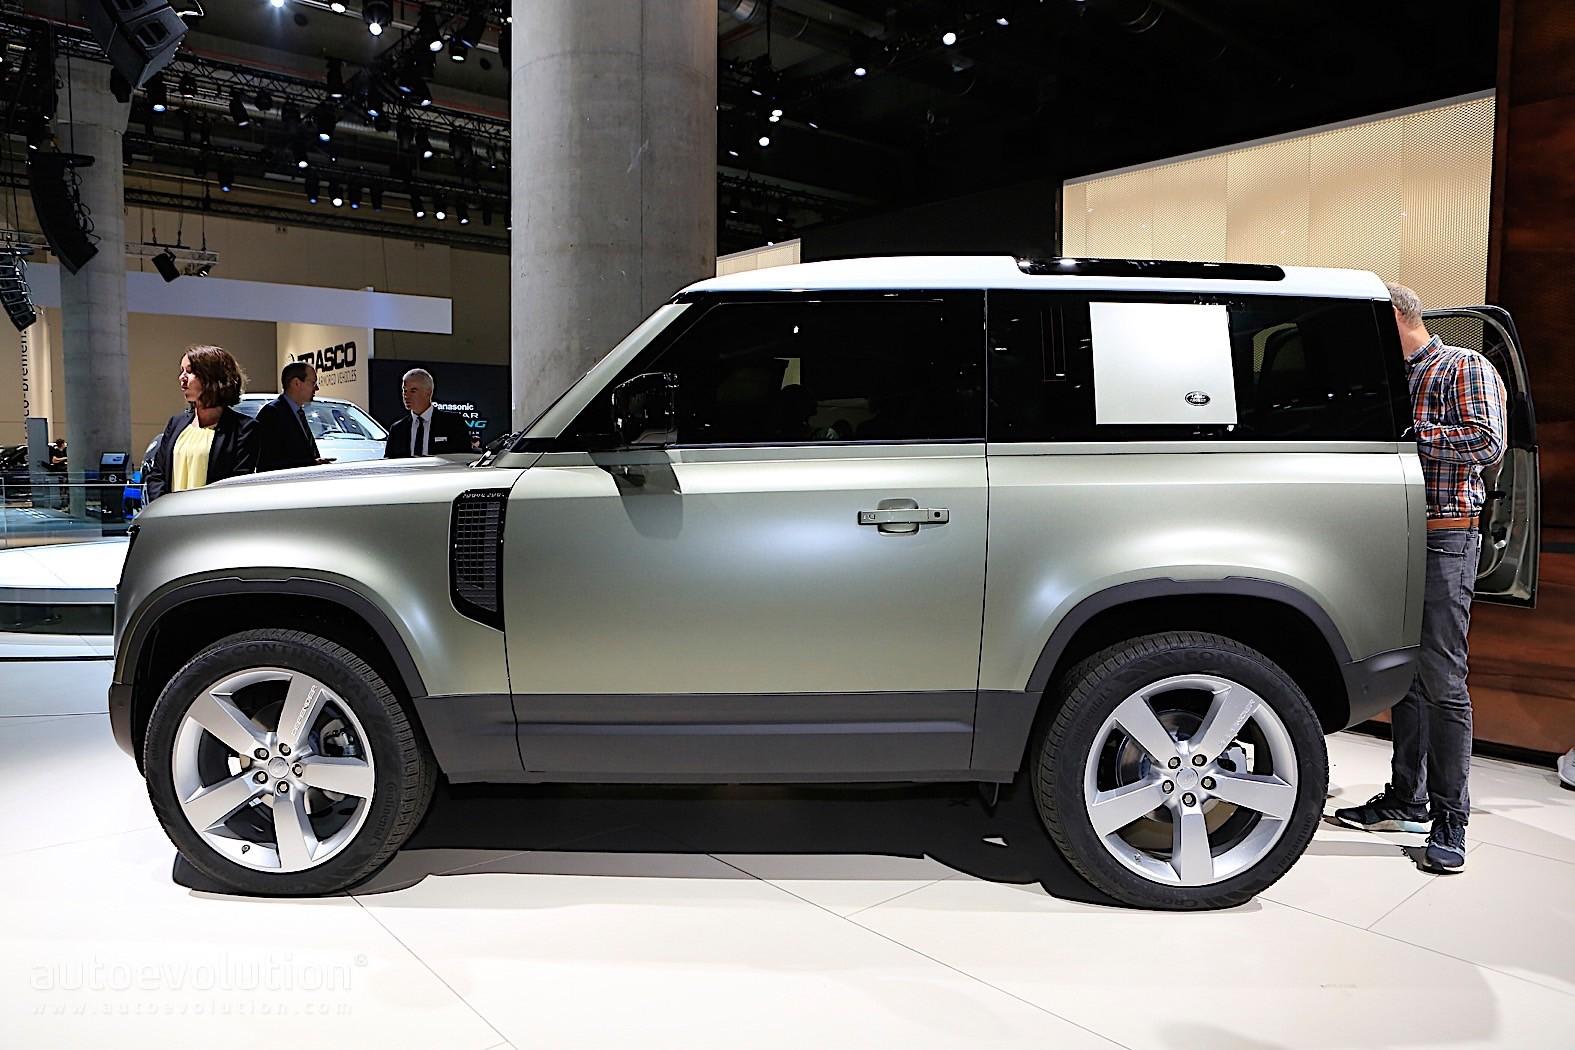 2020 Land Rover Defender Pickup Truck Rendered, Yet It Won ...